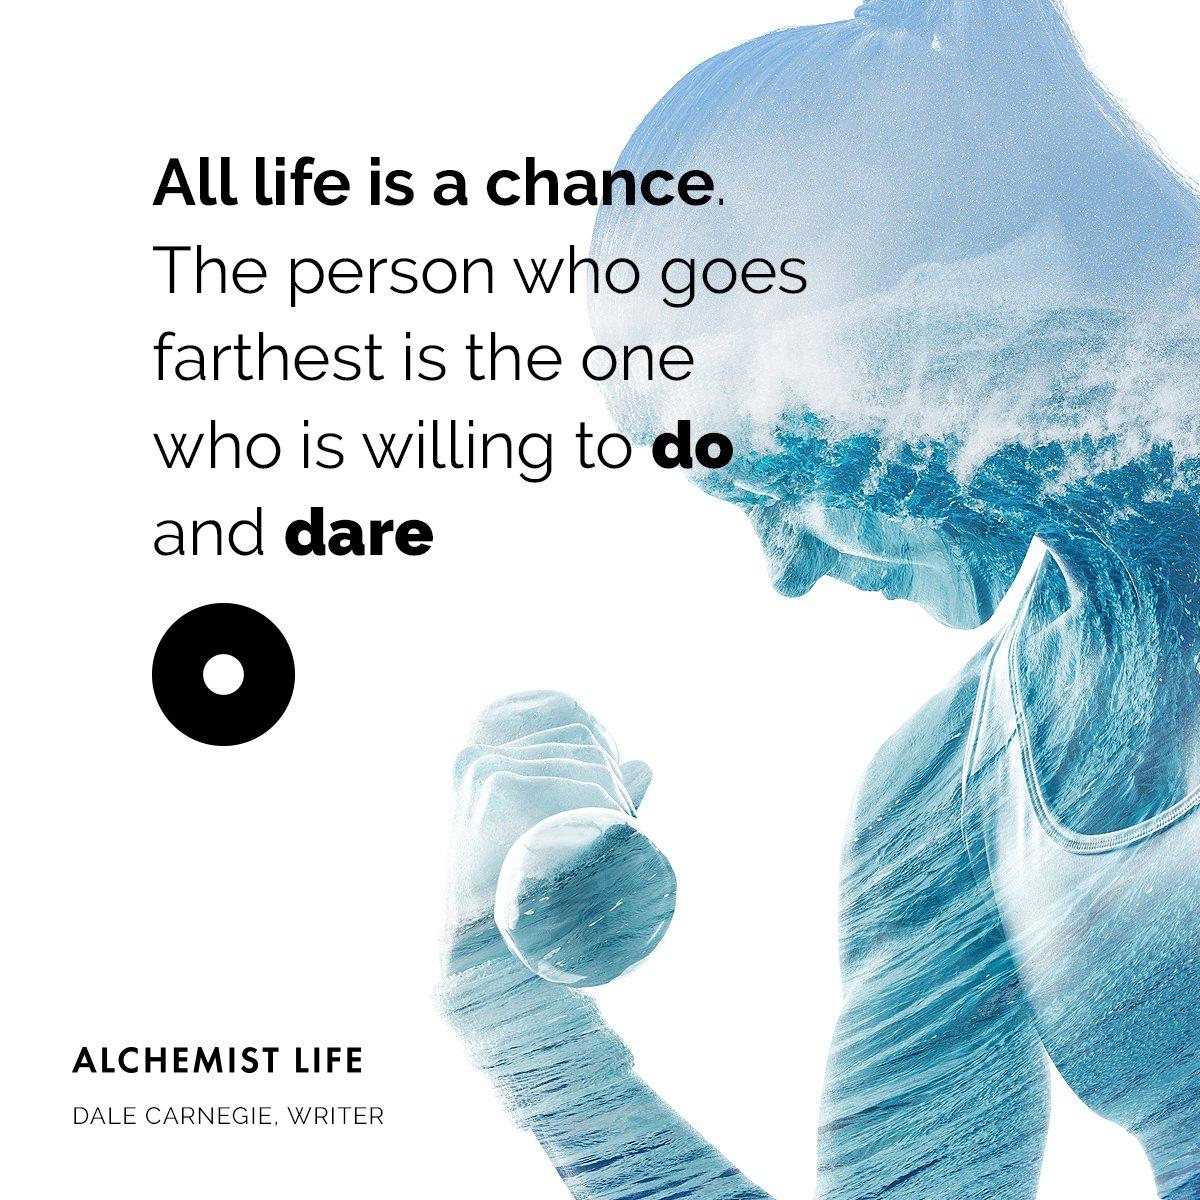 alchemist life alchemistlifeuk twitter 0 replies 0 retweets 0 likes